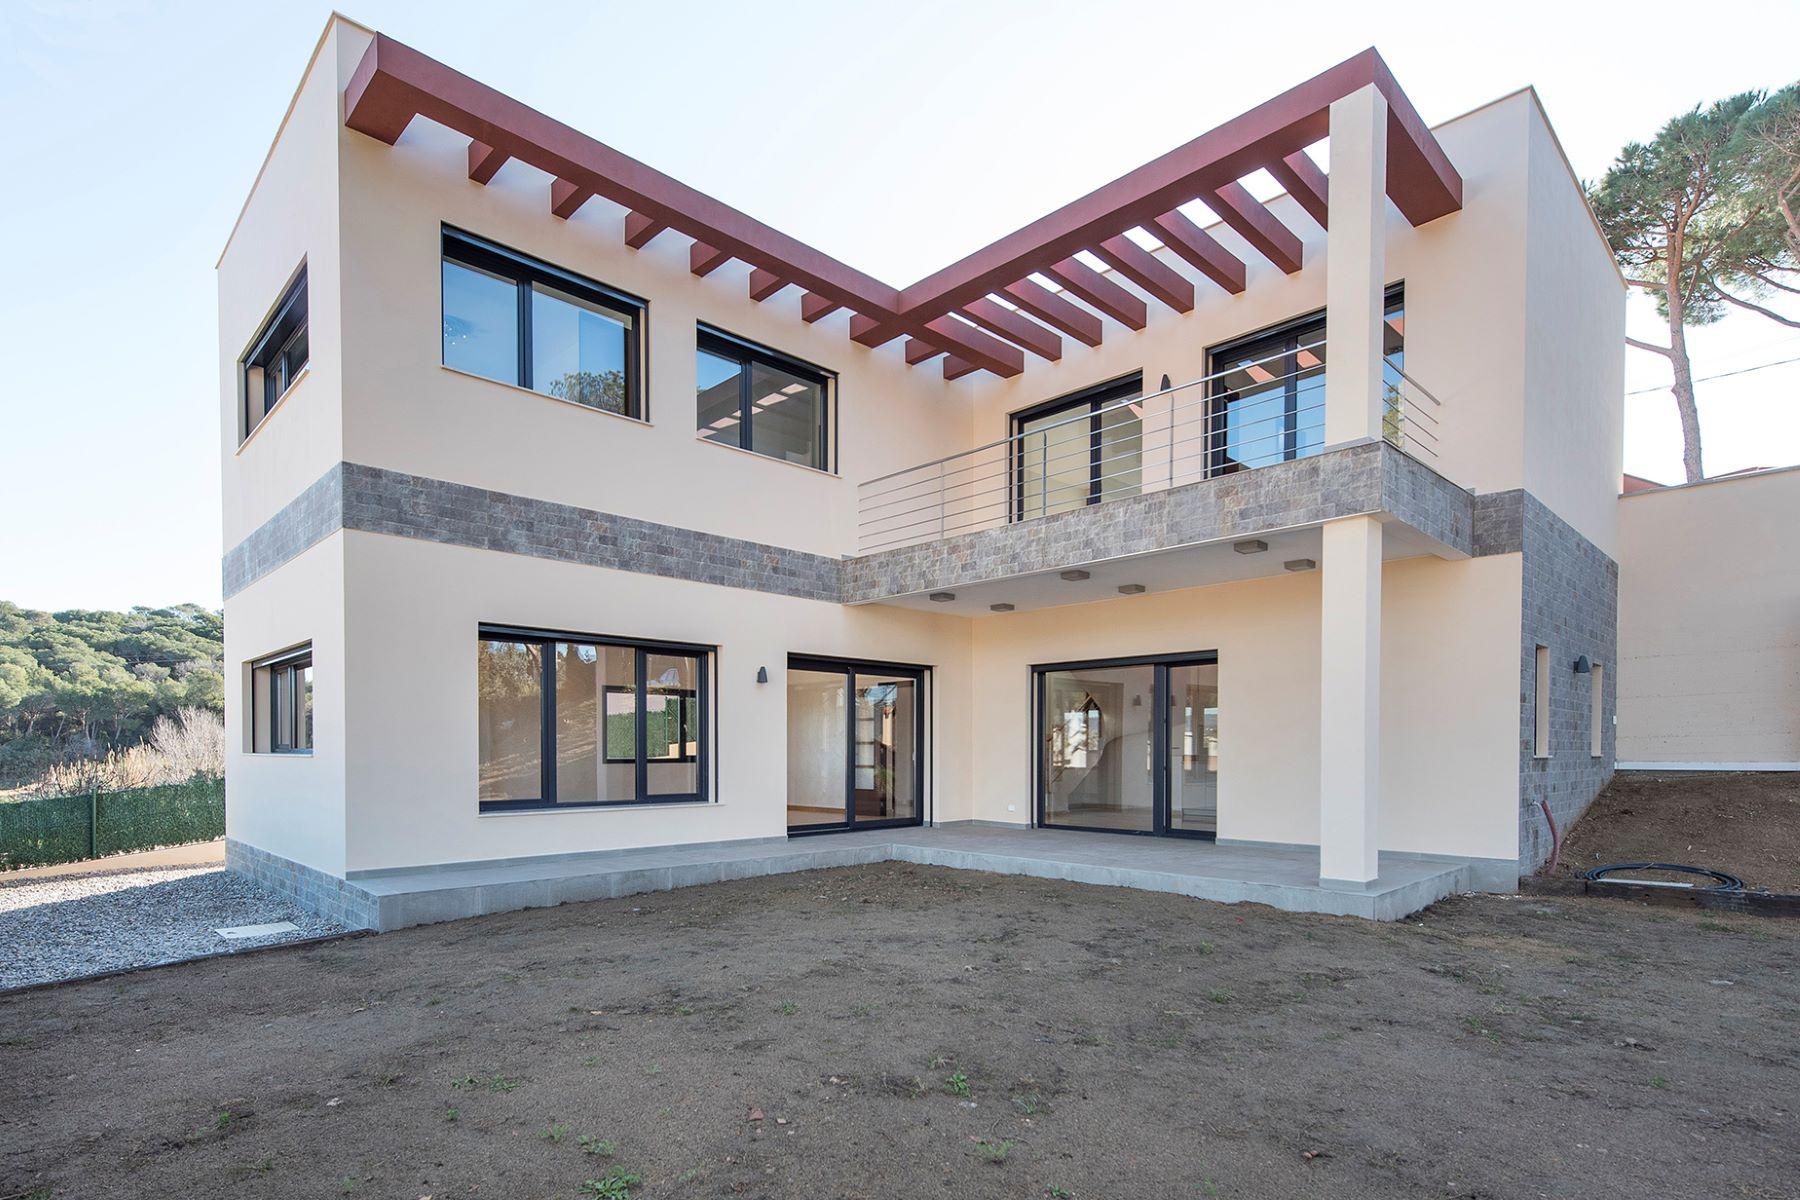 Single Family Home for Sale at Modern newly built house Playa De Aro, Costa Brava, 17250 Spain